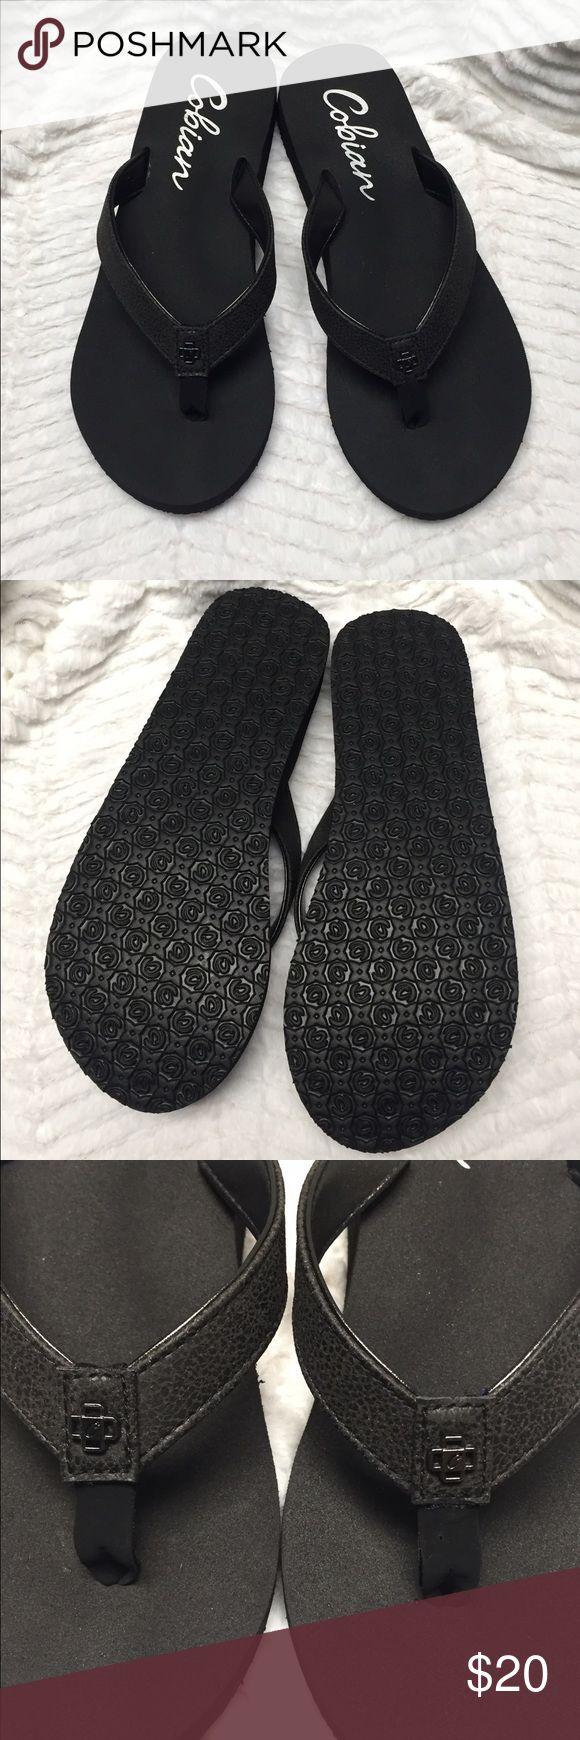 COBIAN FLIP FLOPS NWOT NWOT black flip flops, size 5-6 Cobian Shoes